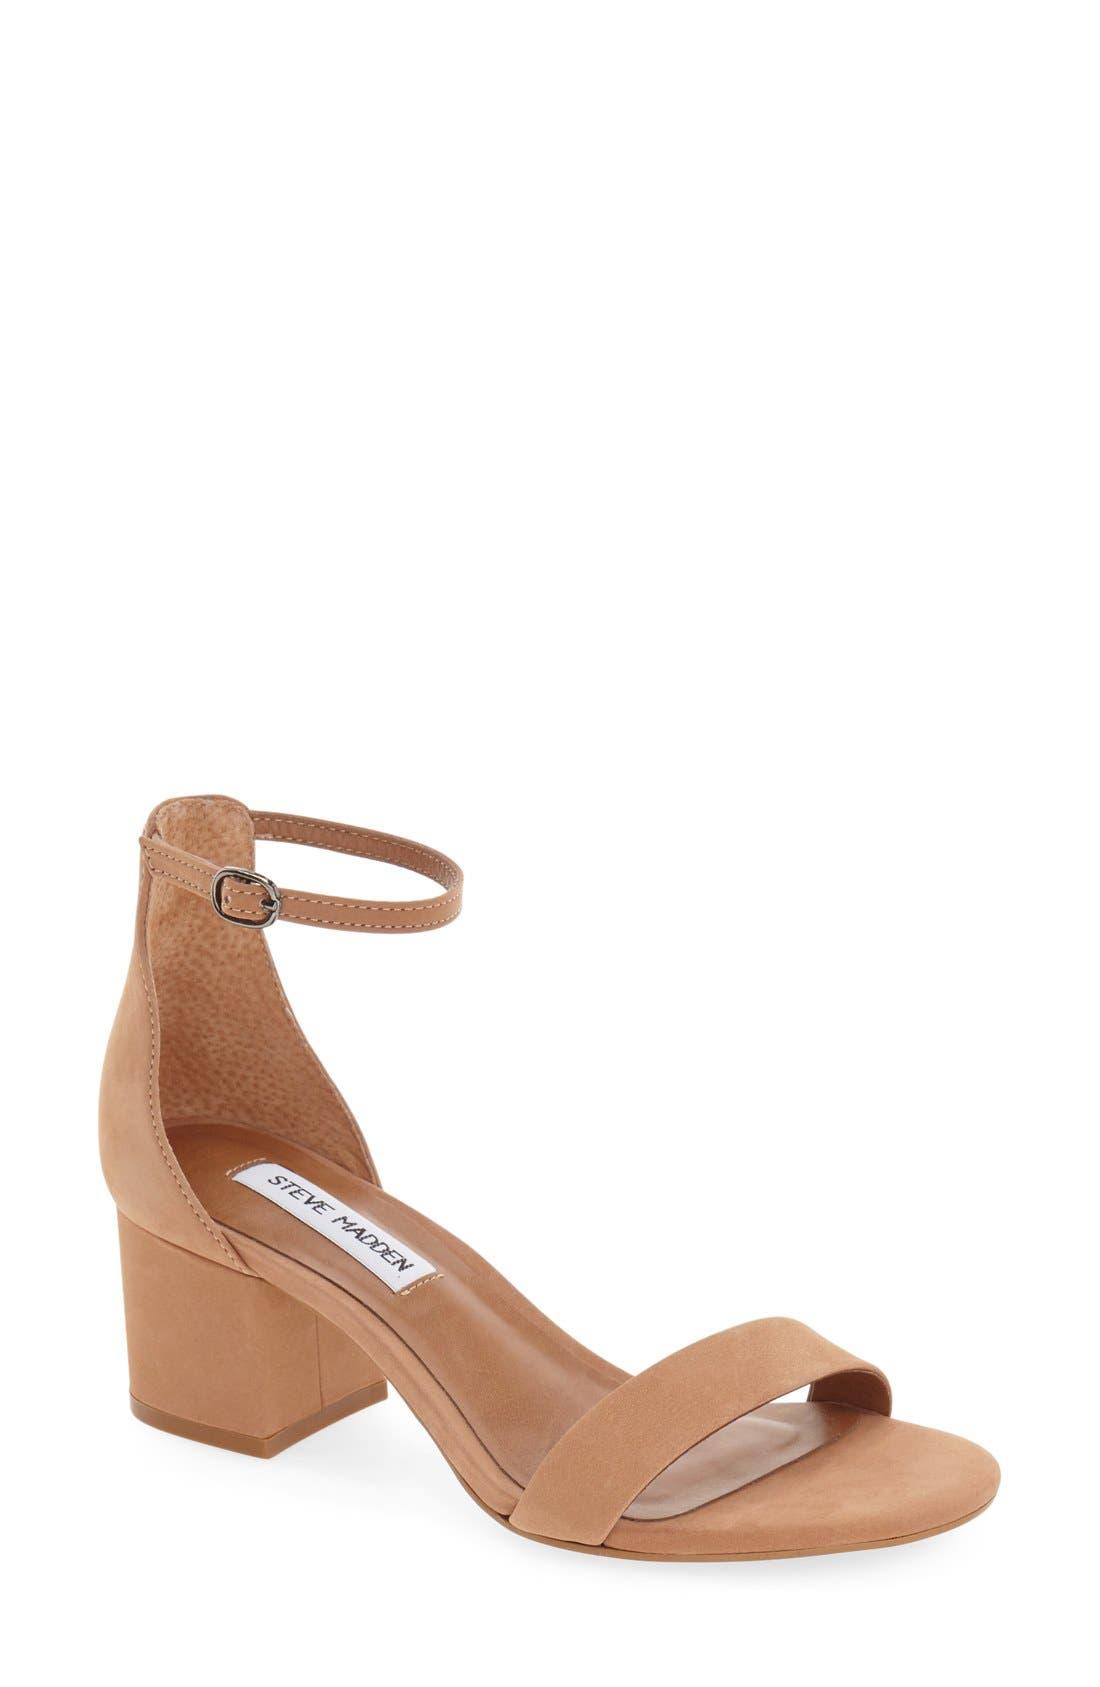 Irenee Ankle Strap Sandal,                             Main thumbnail 18, color,